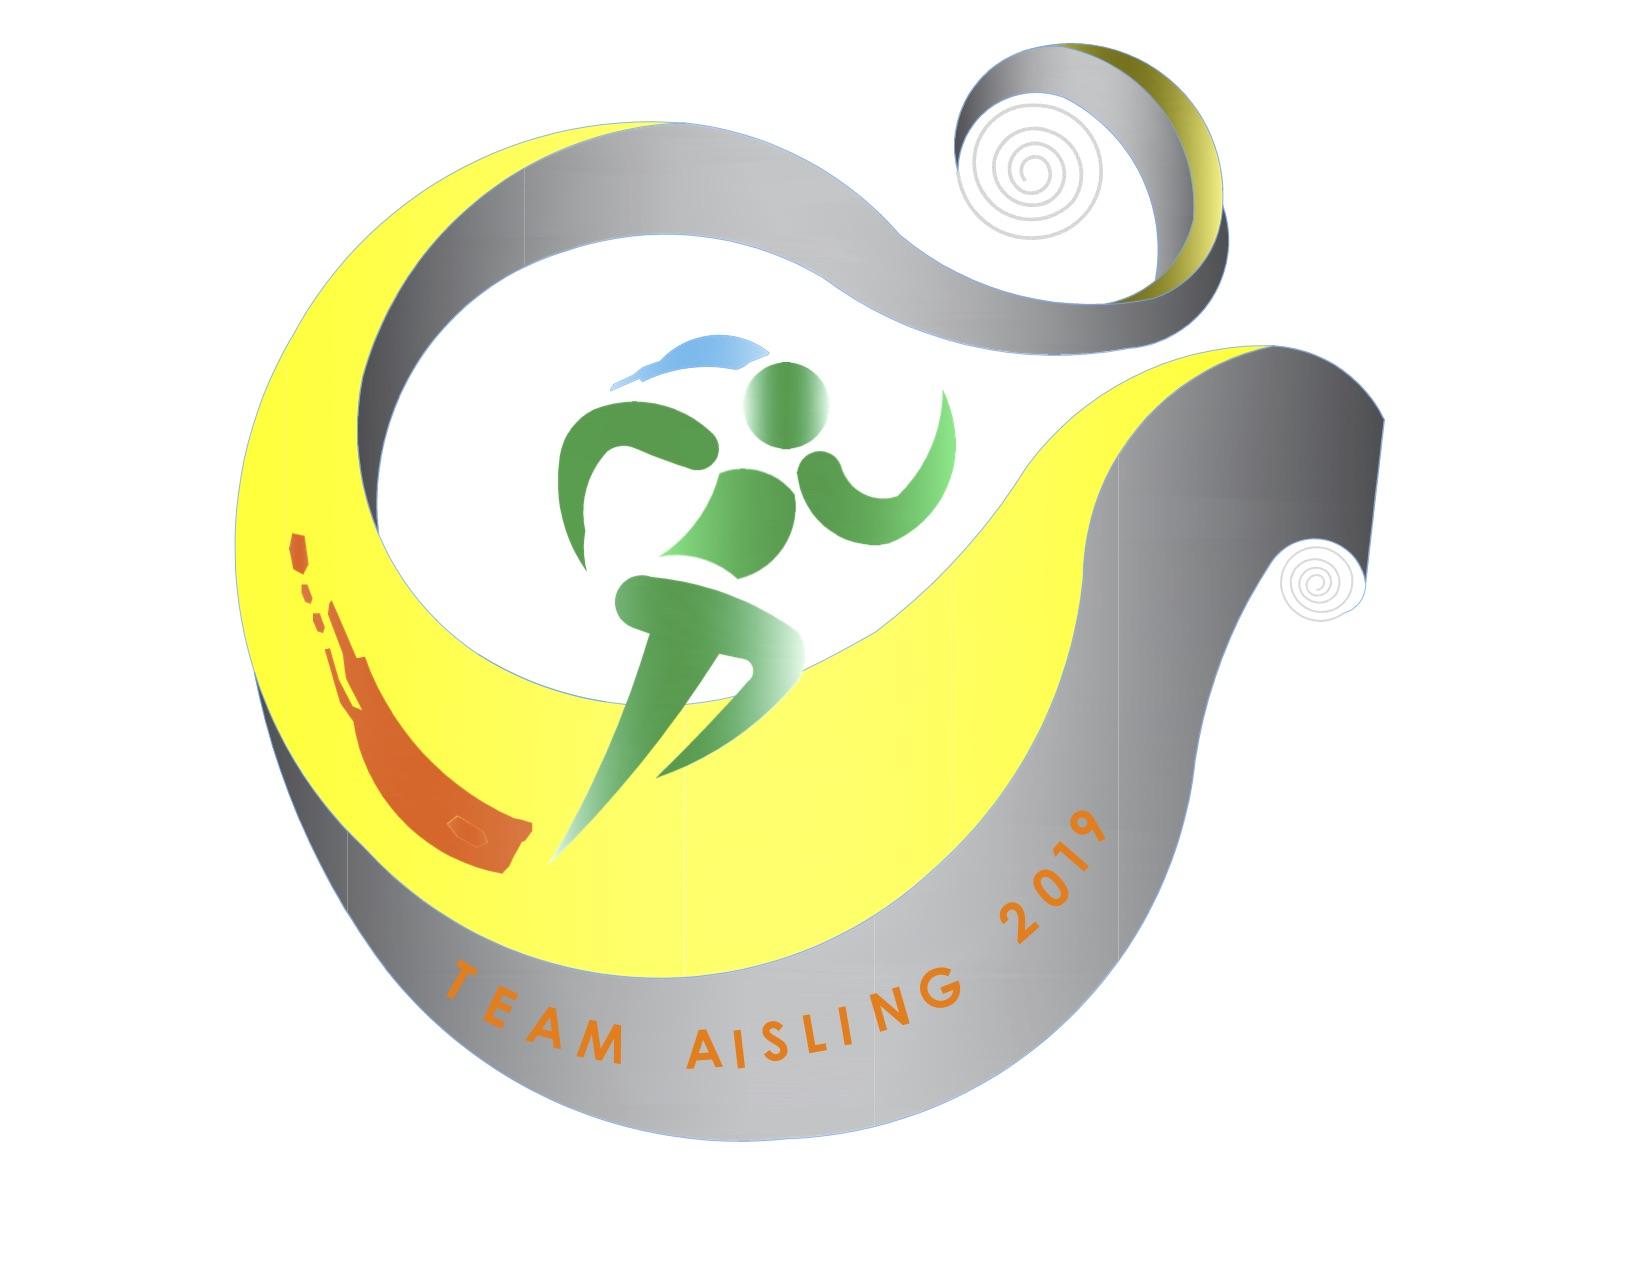 Team Aisling